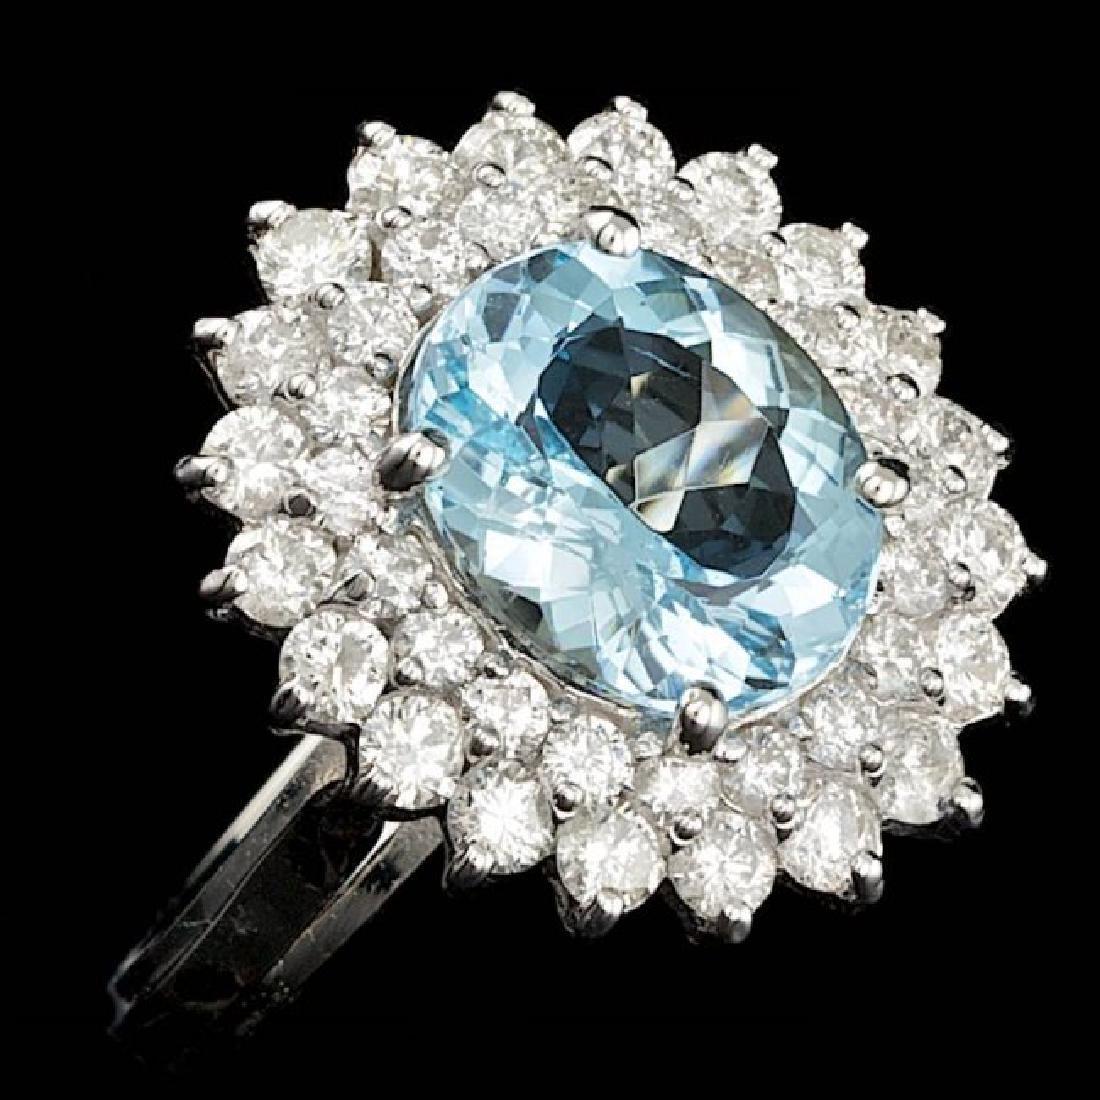 14k Gold 3.00ct Aquamarine 1.60ct Diamond Ring - 3